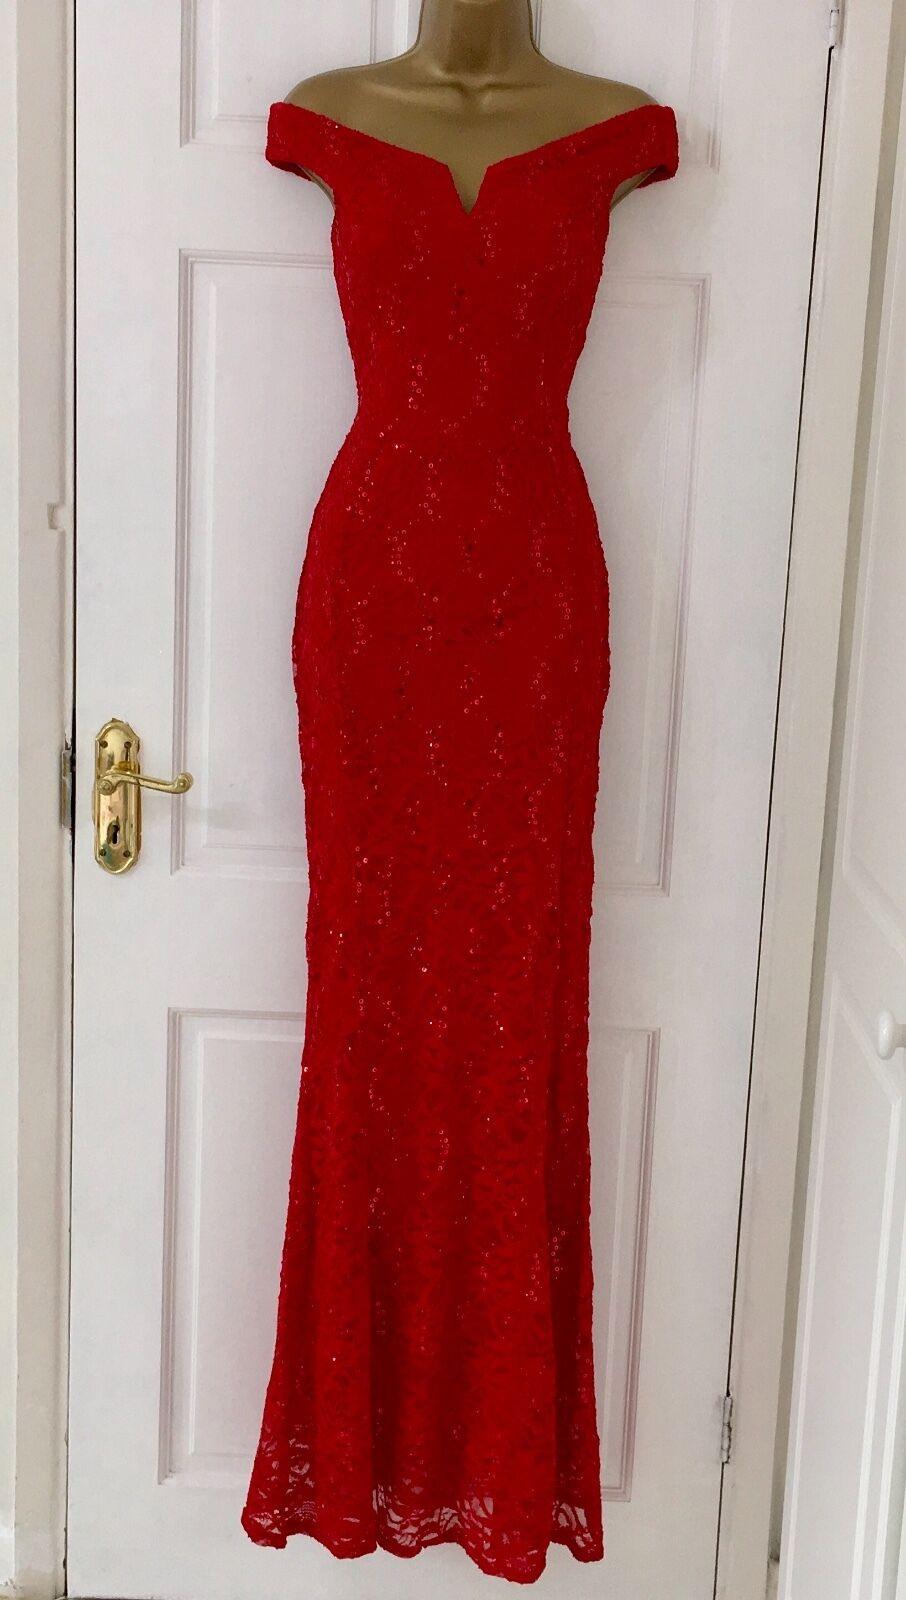 Formal Luxus Abendkleid Ebay Stylish - Abendkleid